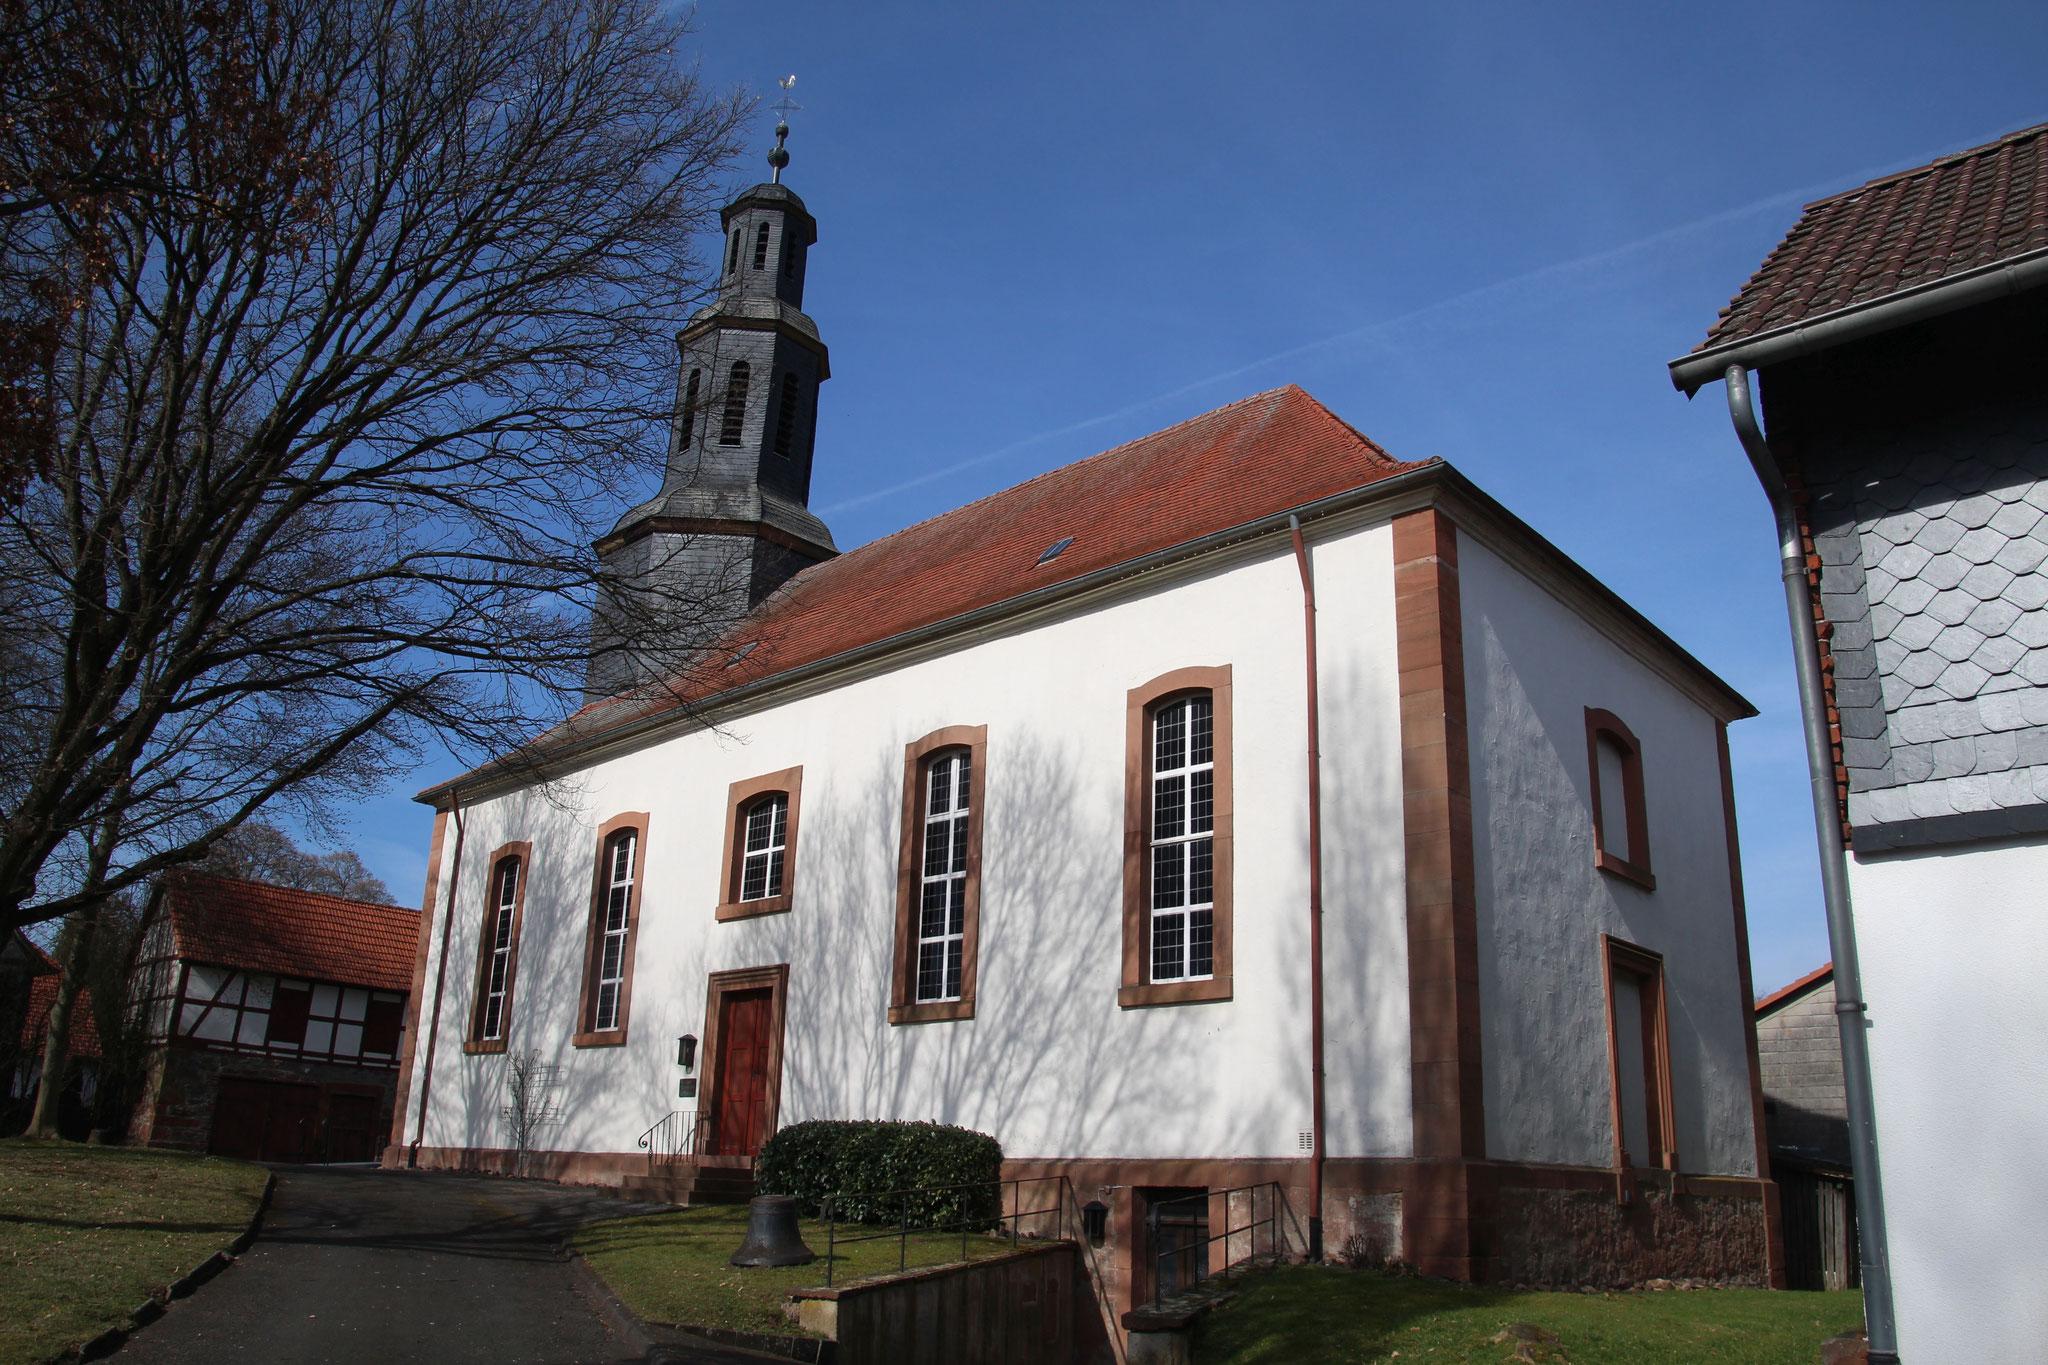 Pfarrkirche Elnhausen   Bildquelle: Gerold Rosenberg bei Wikipedia